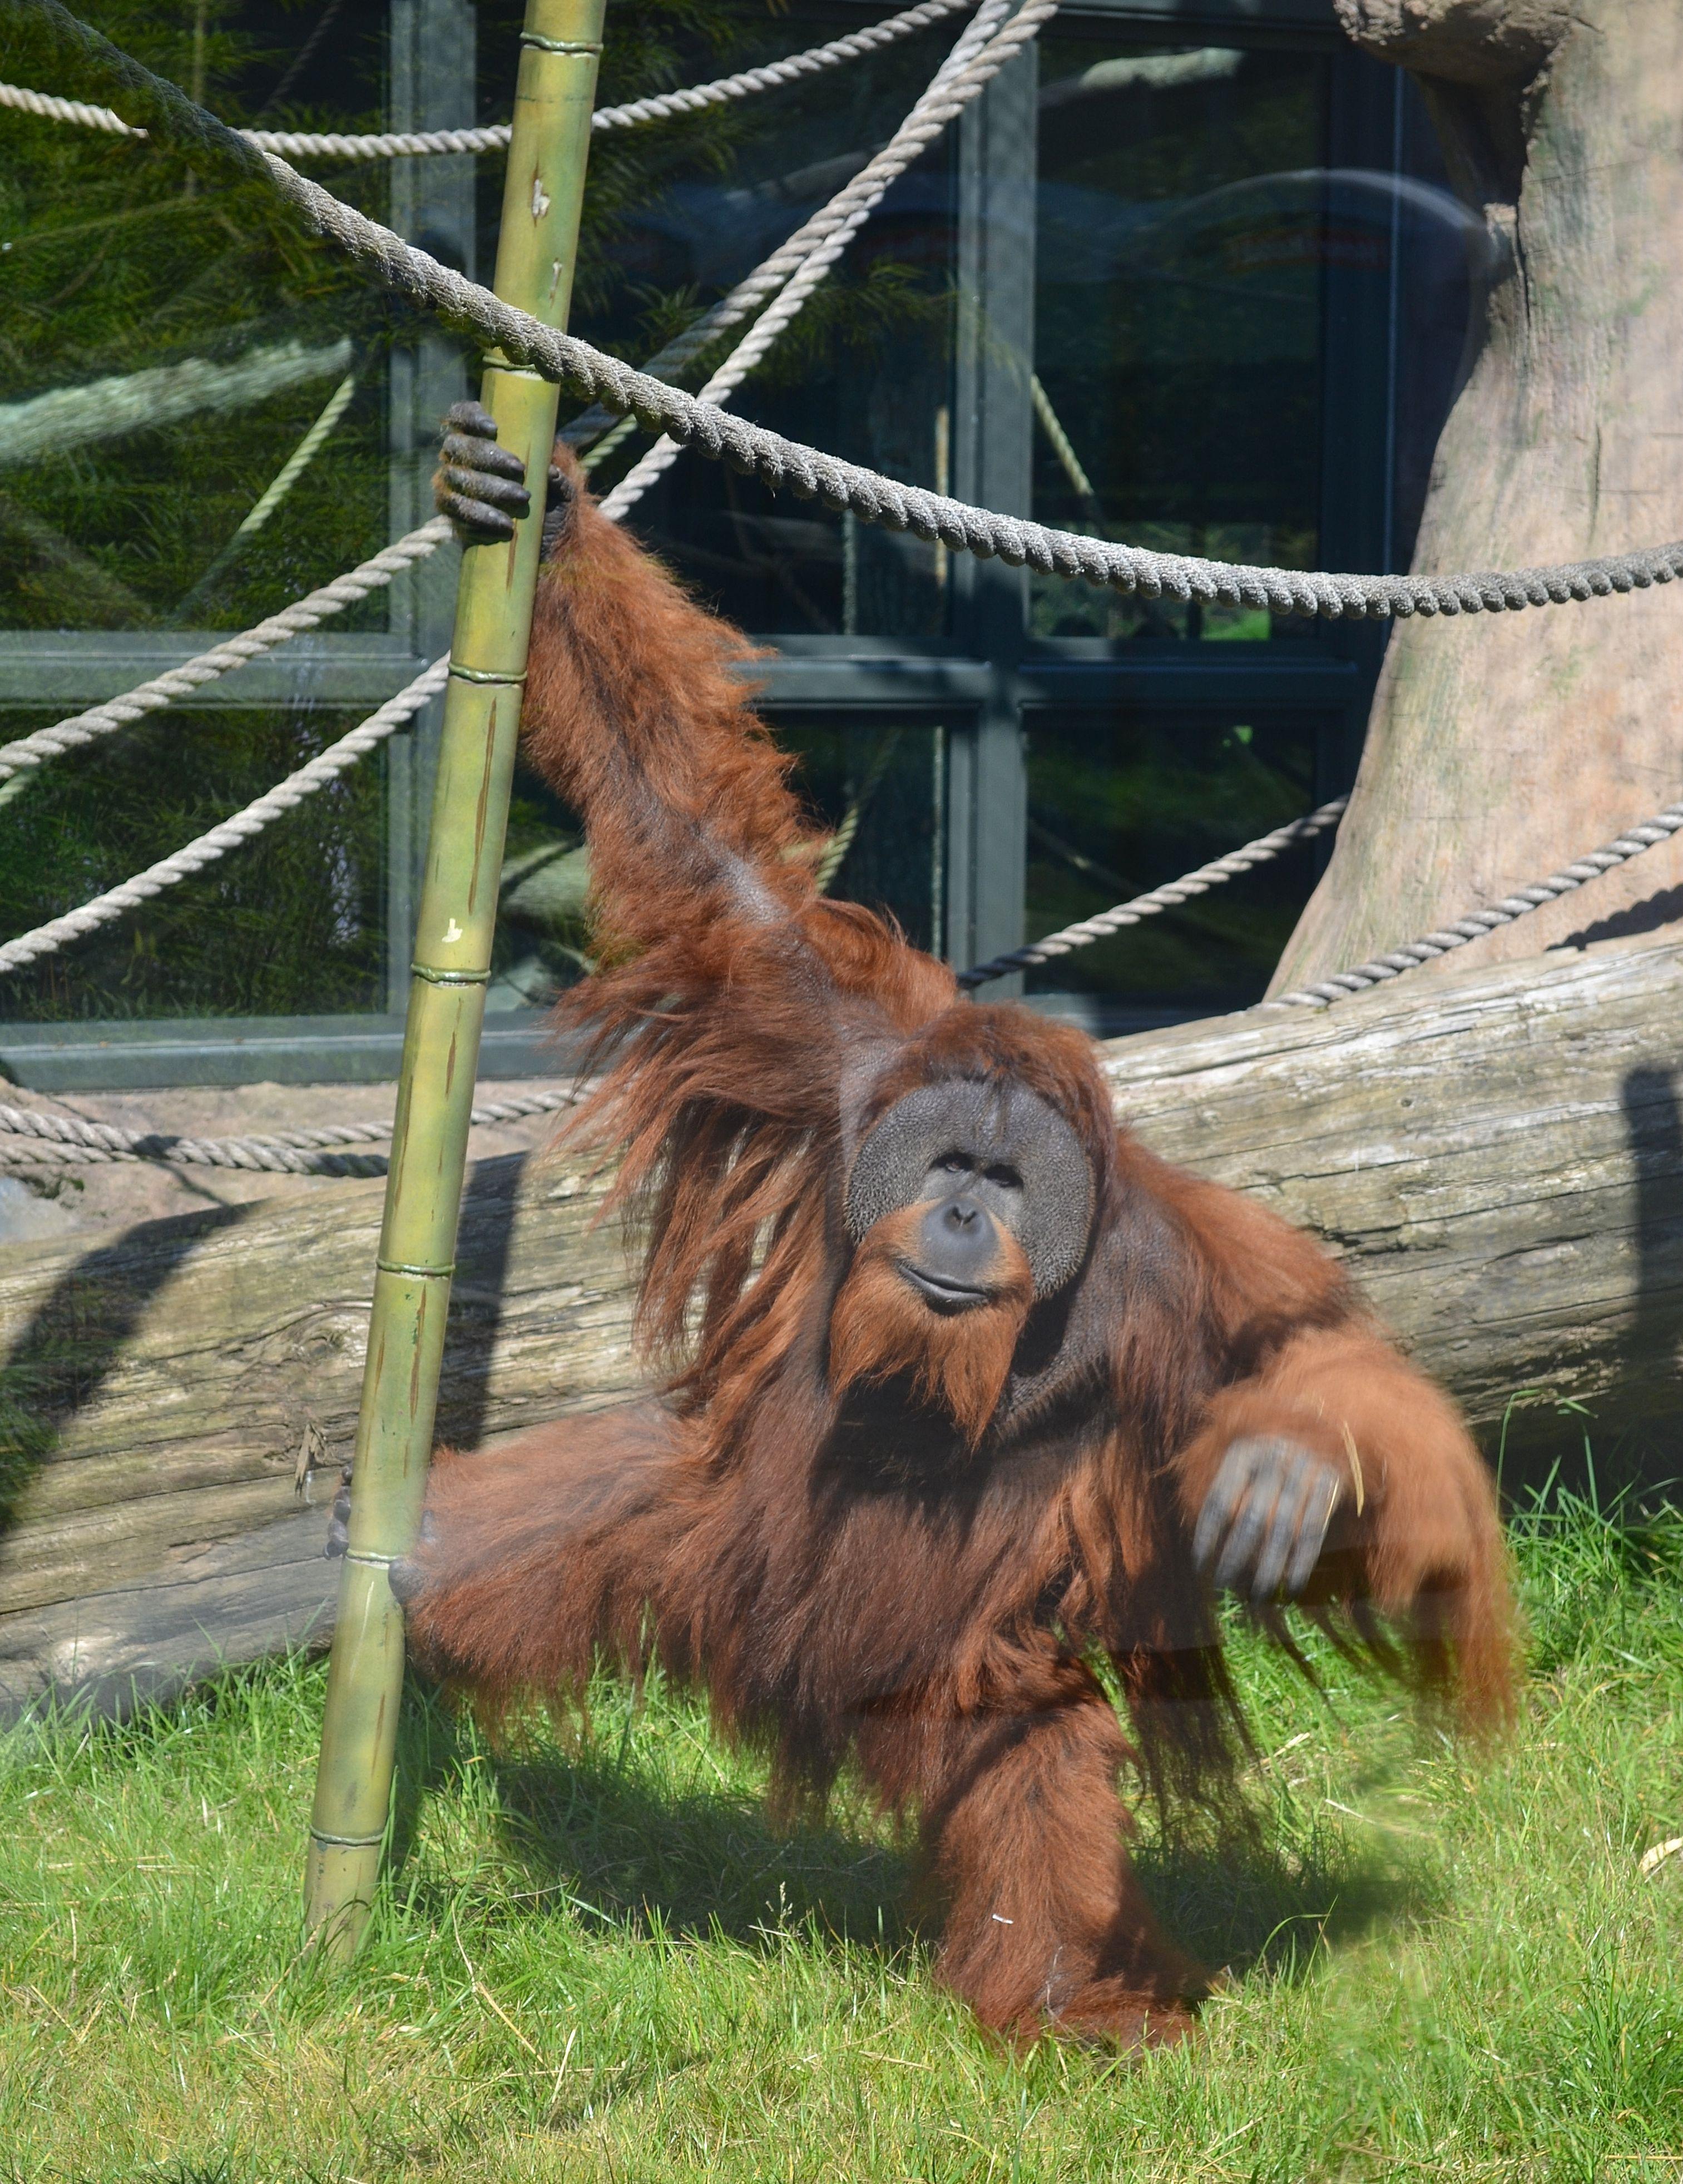 Oregon Zoo: Orangutan At The Portland, Oregon Zoo